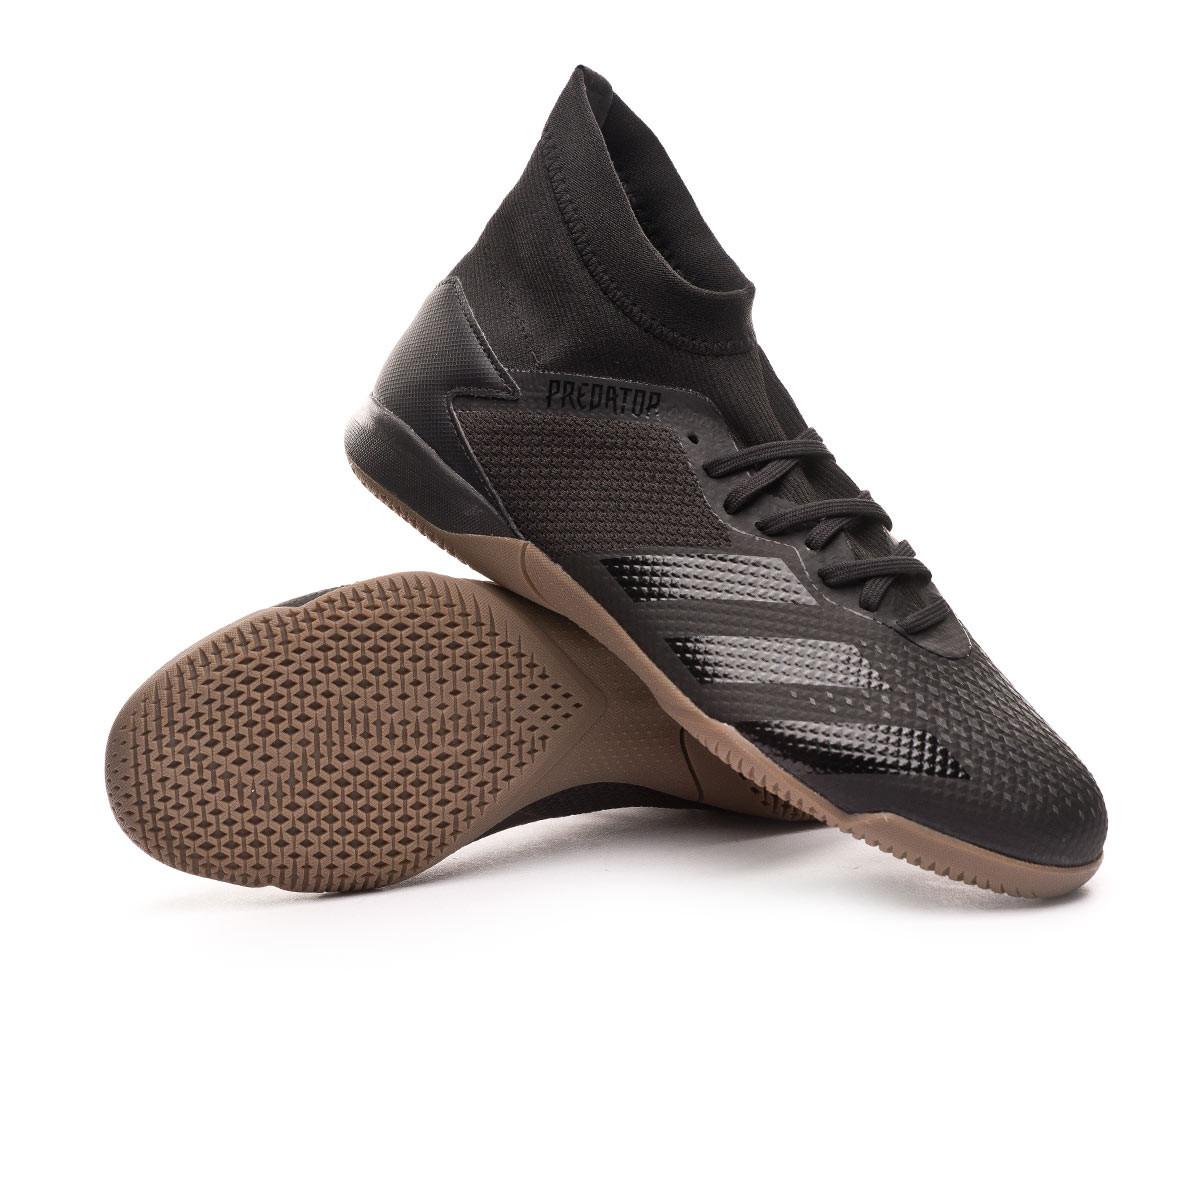 chaussures de futsal adidas noire